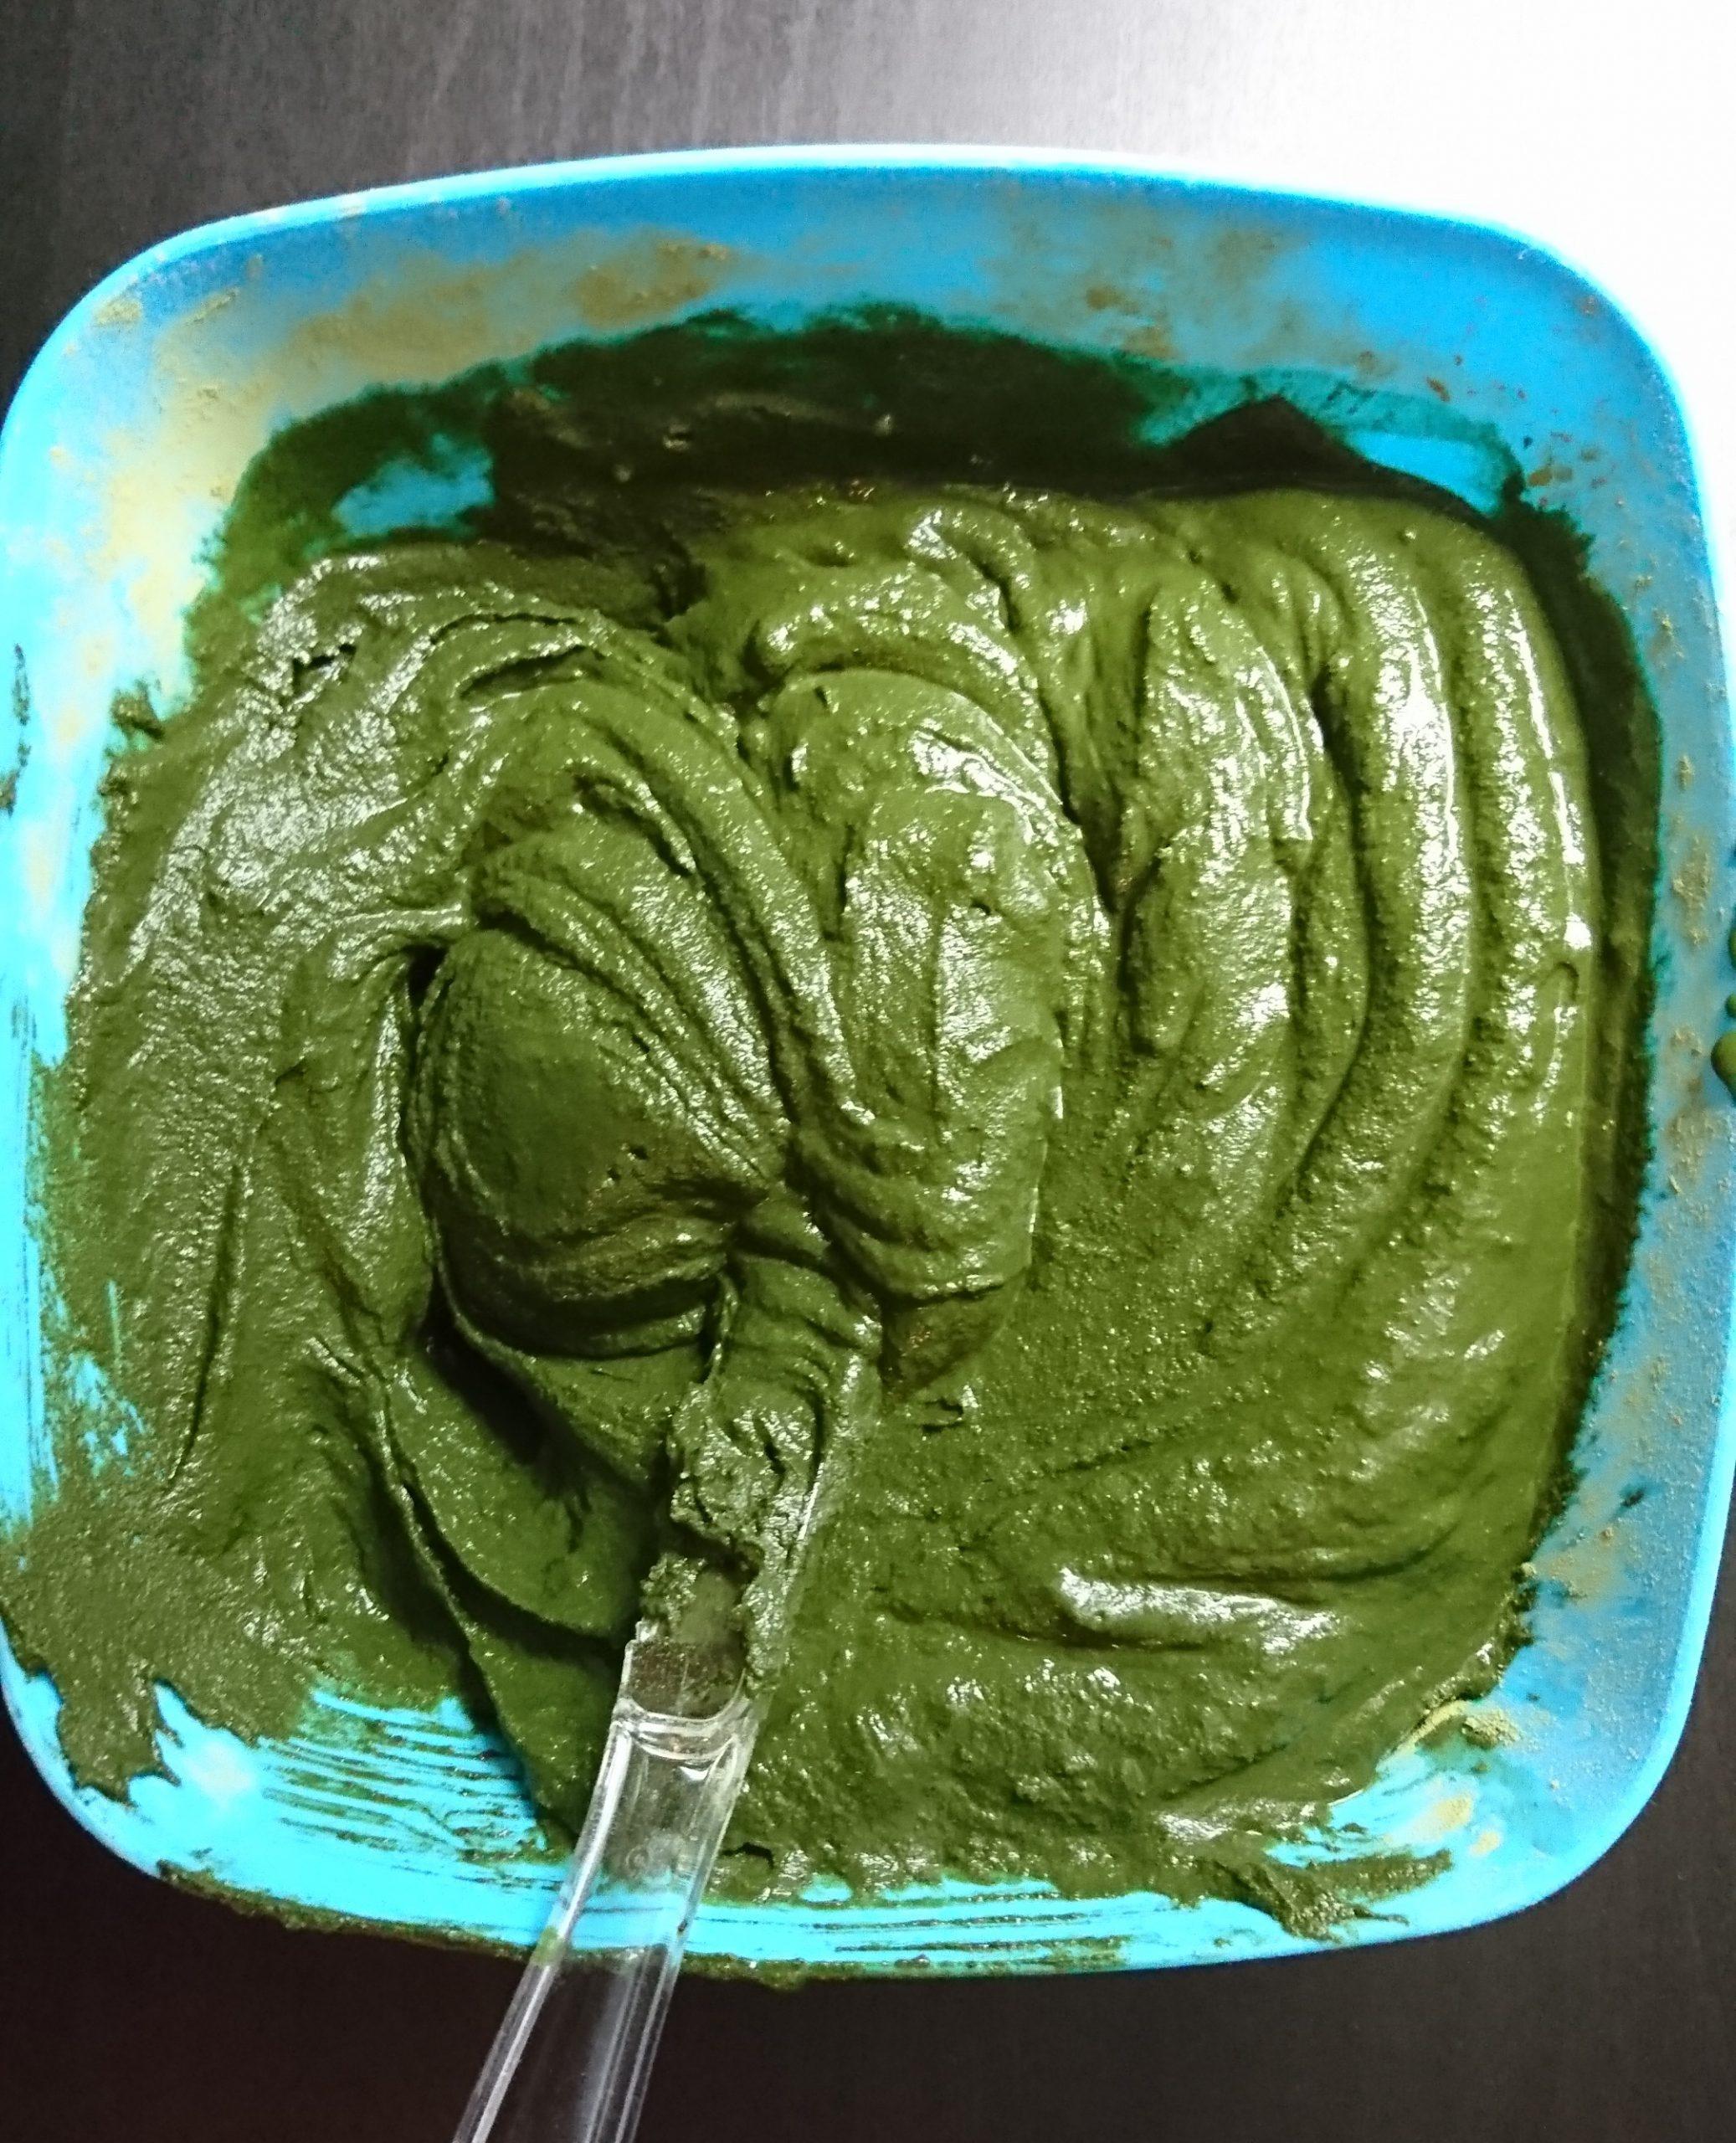 How to Use Indigo Powder for Hair